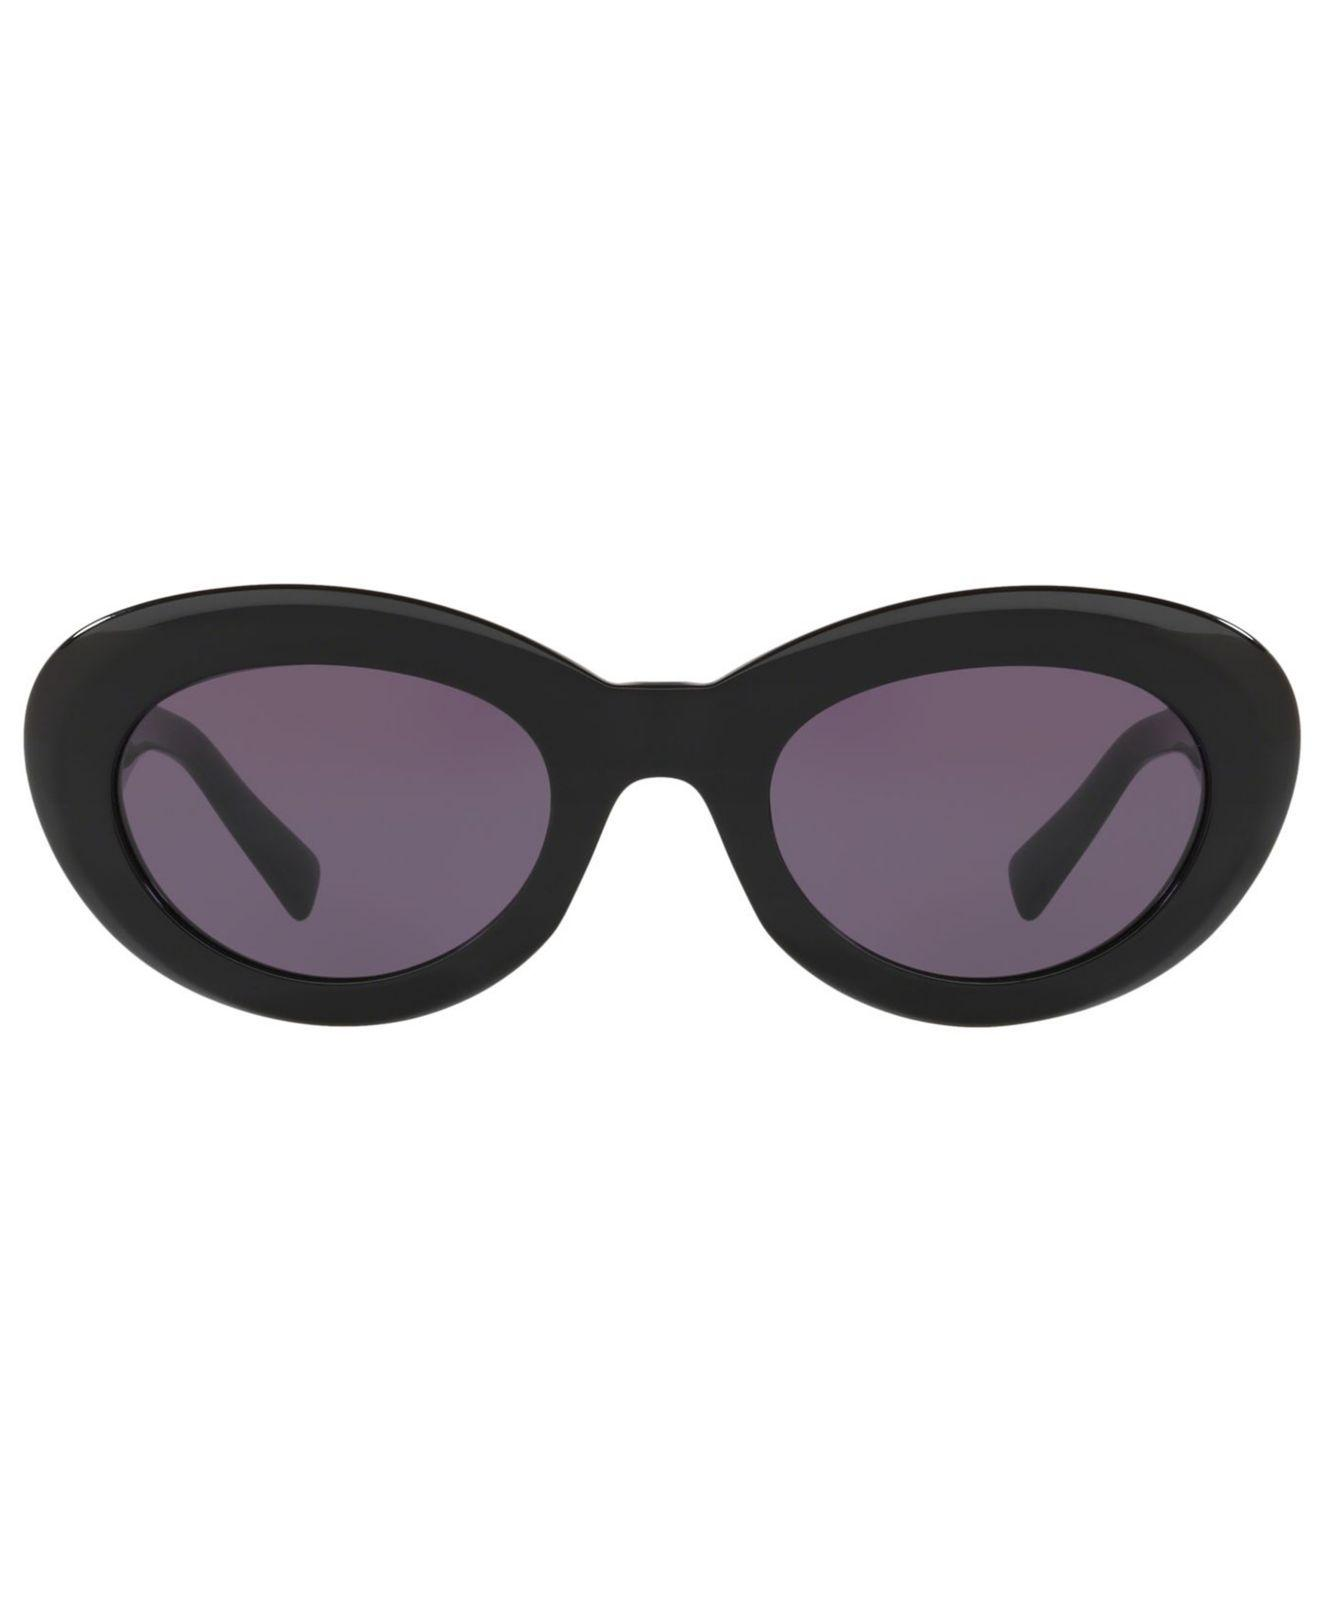 e8b5ab067b Lyst - Versace Sunglasses